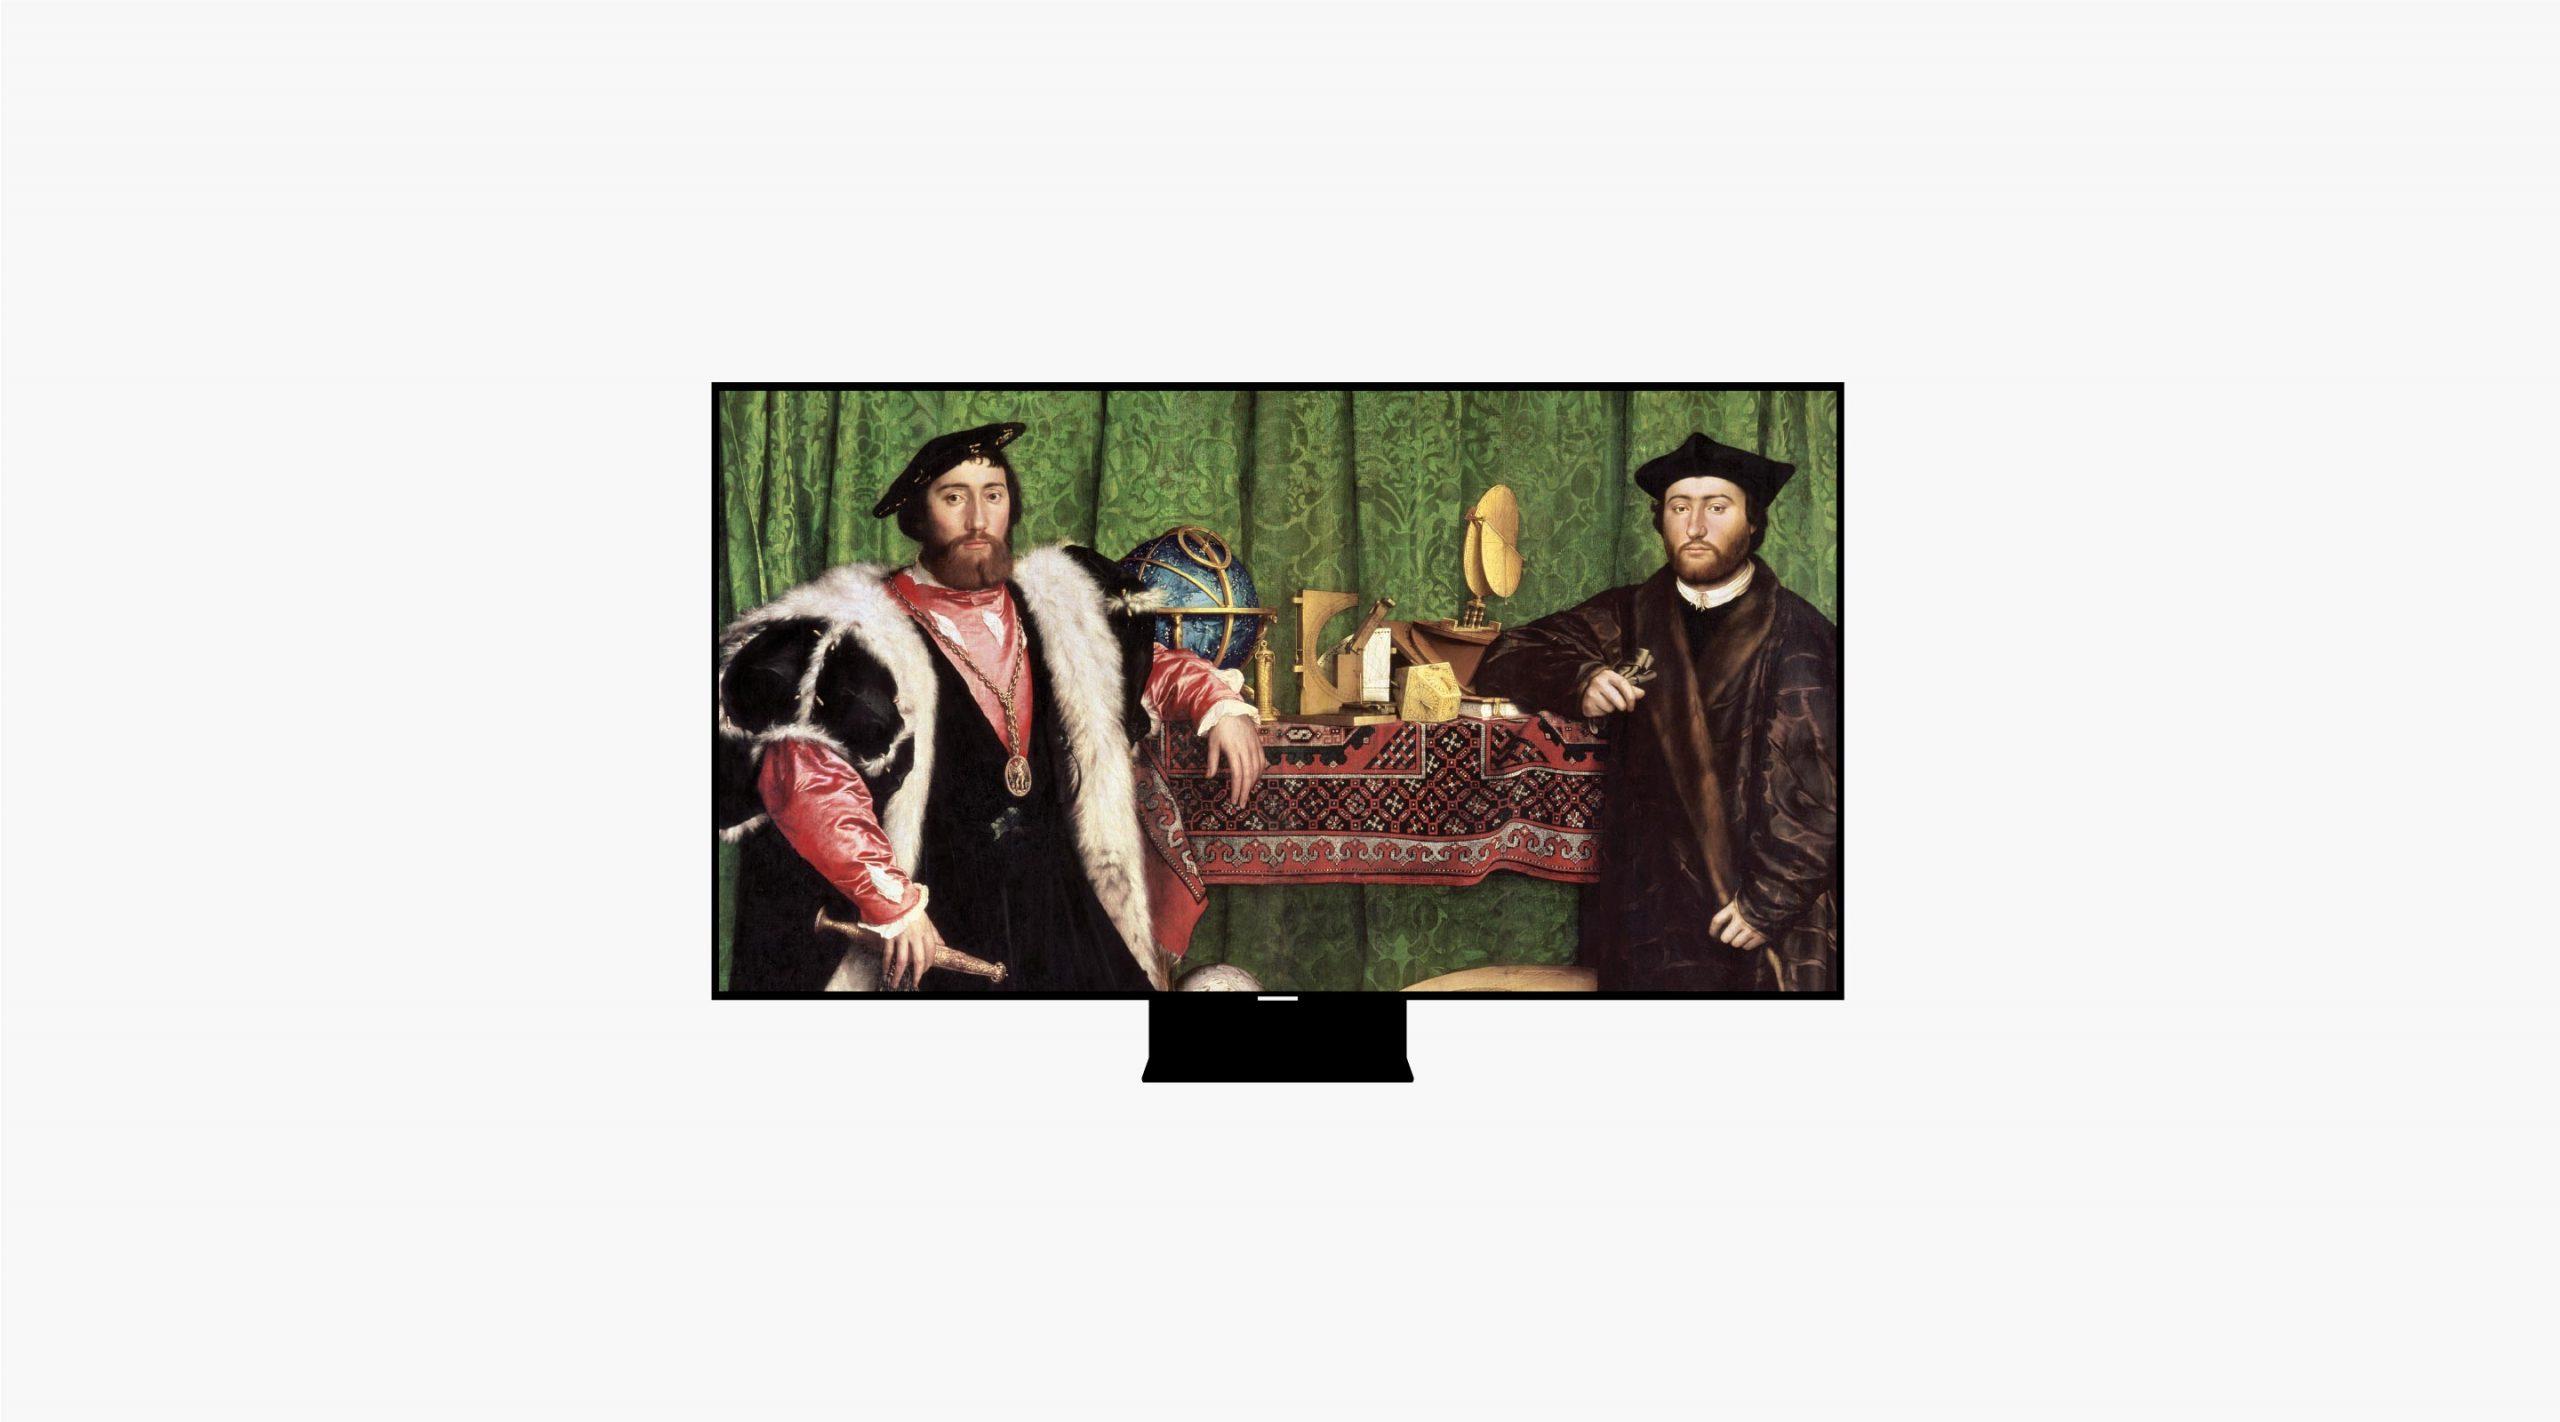 ikono.TV Branding visuelles Leitmotiv ambassador – Uthmöller und Partner